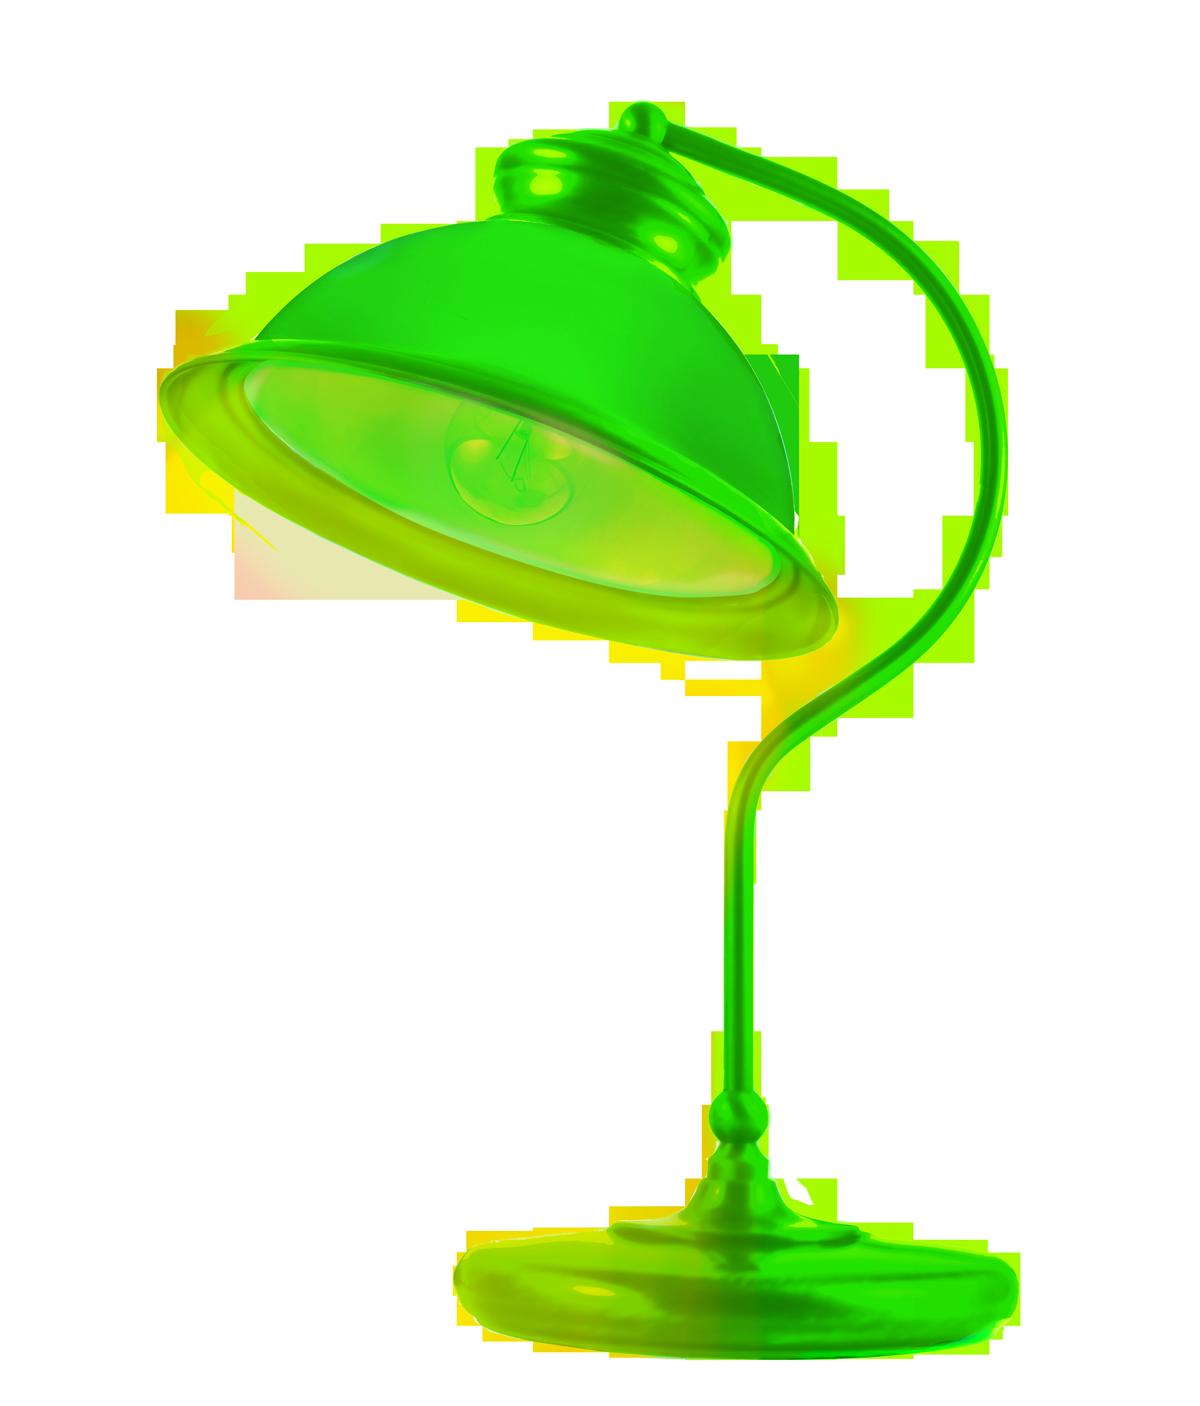 Lamp clipart gene. Careers bottom line marketing